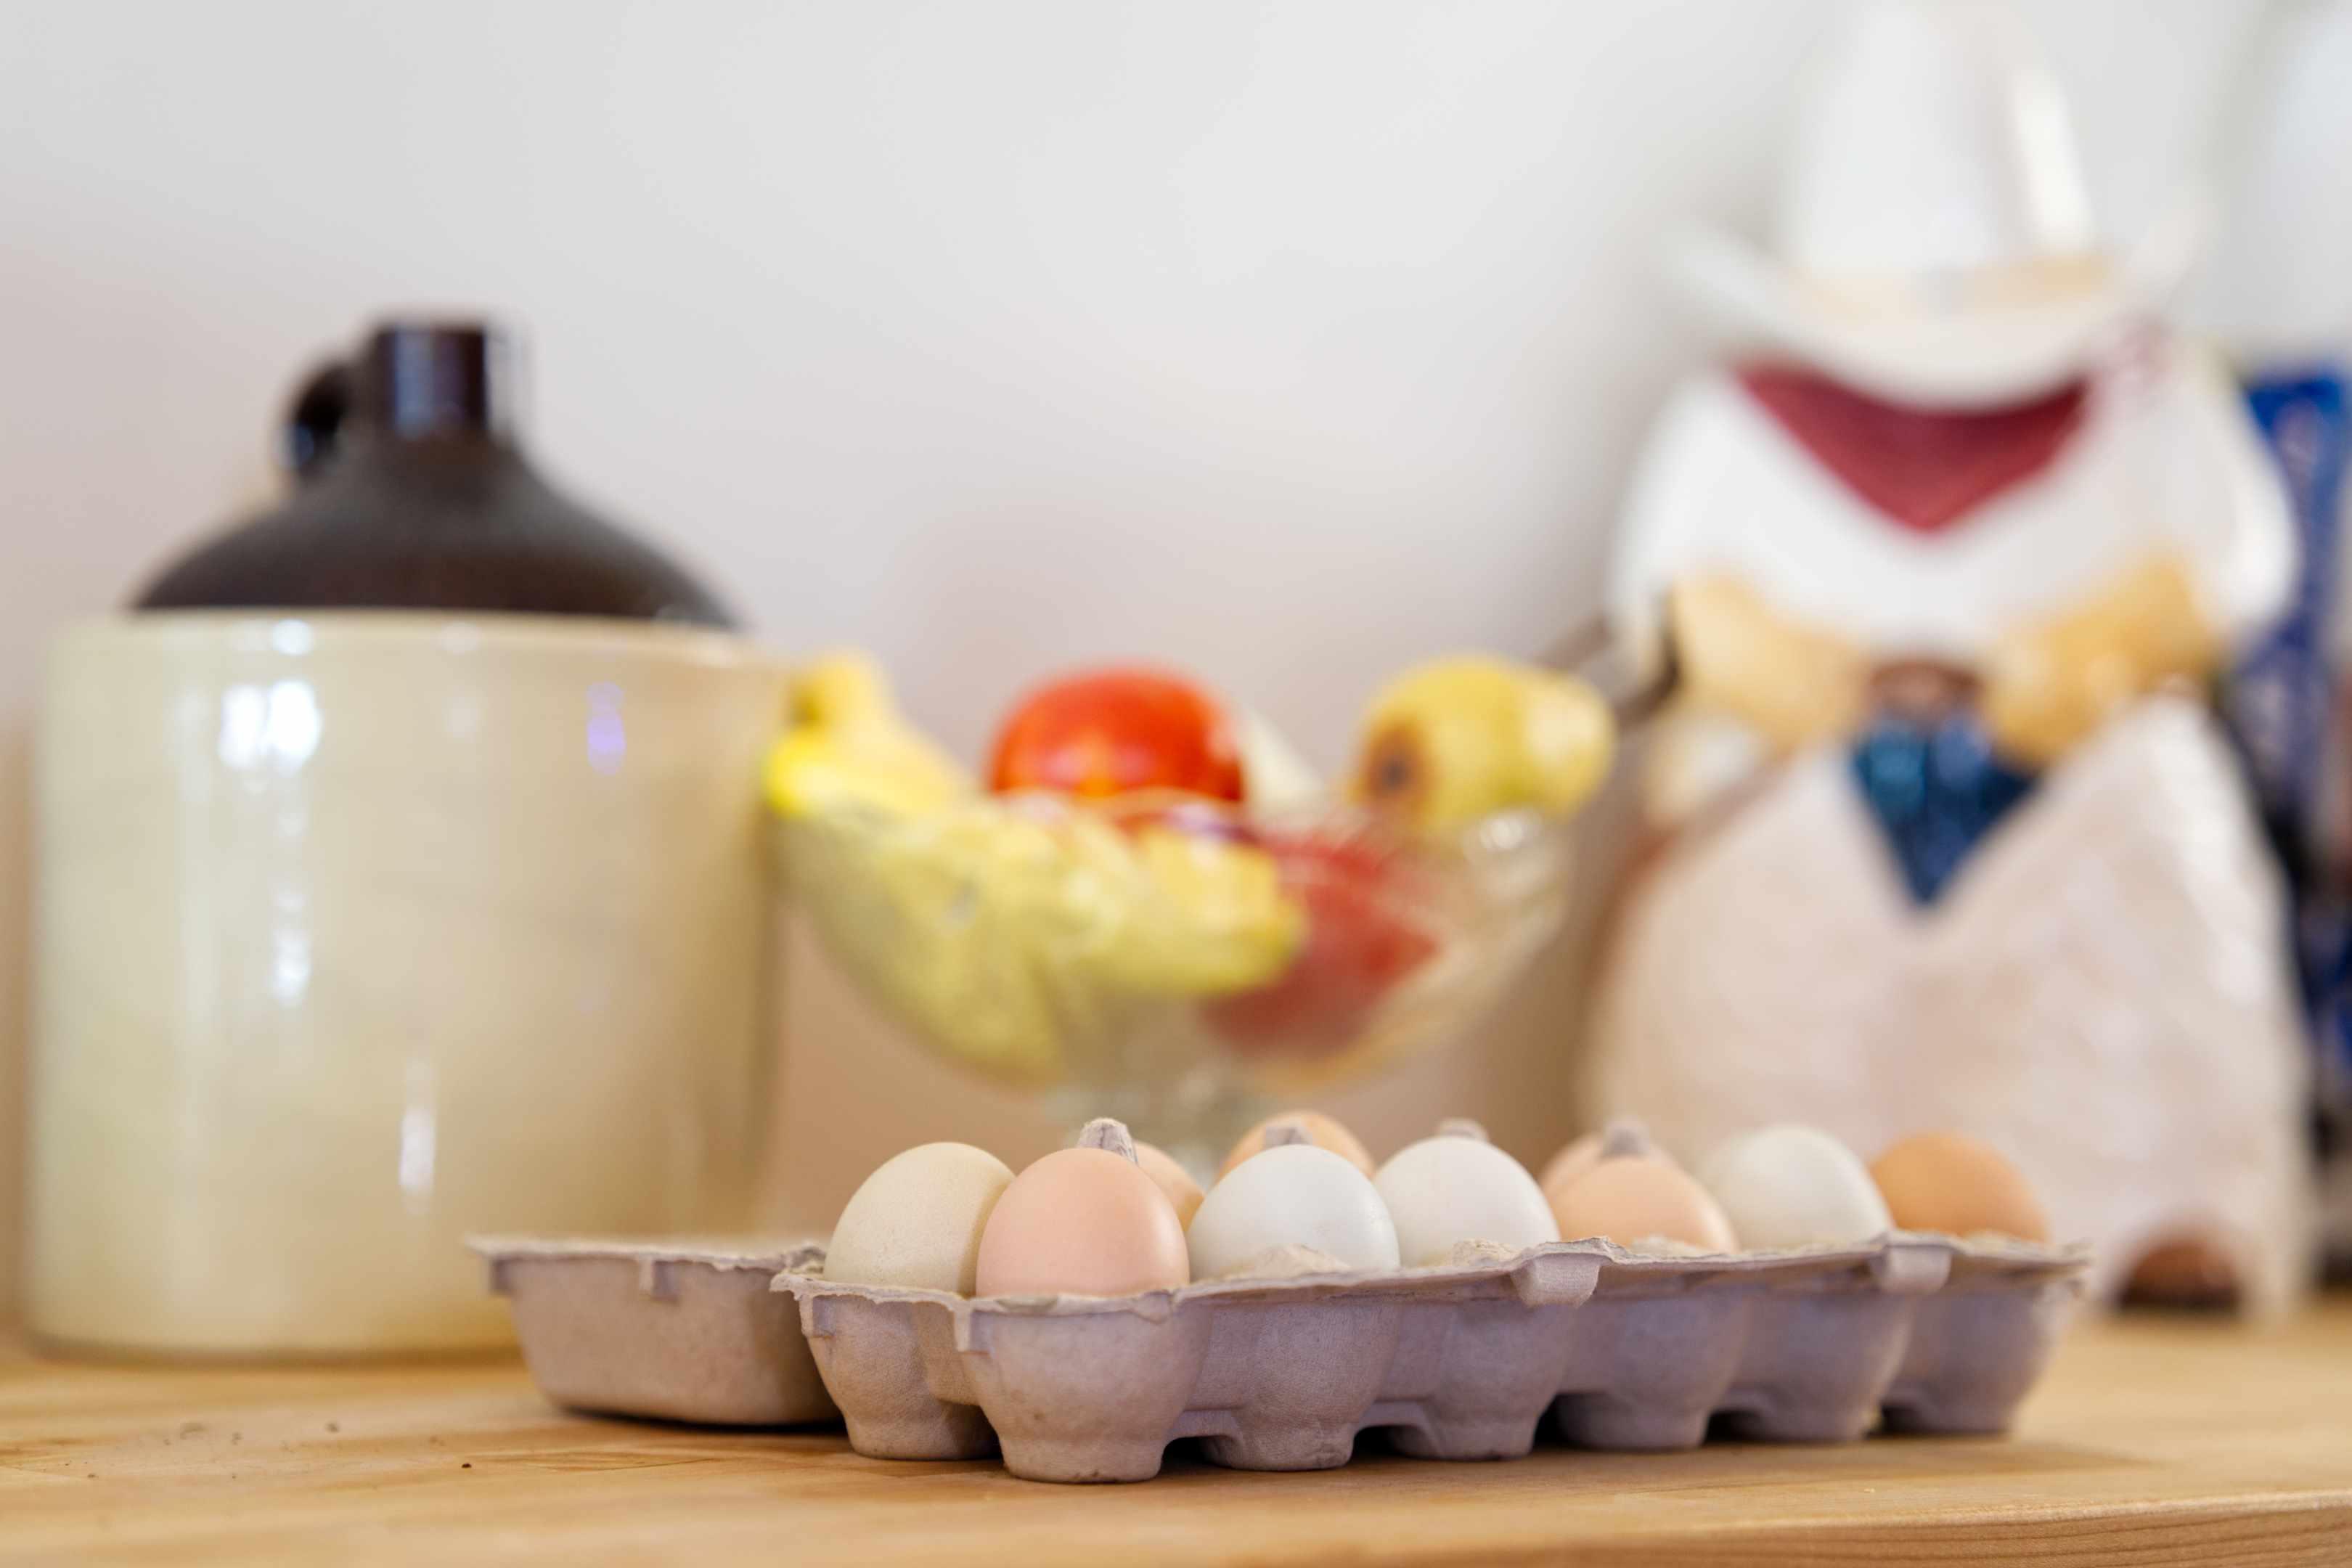 farm fresh eggs in carton sit on kitchen counter next to cookie jar